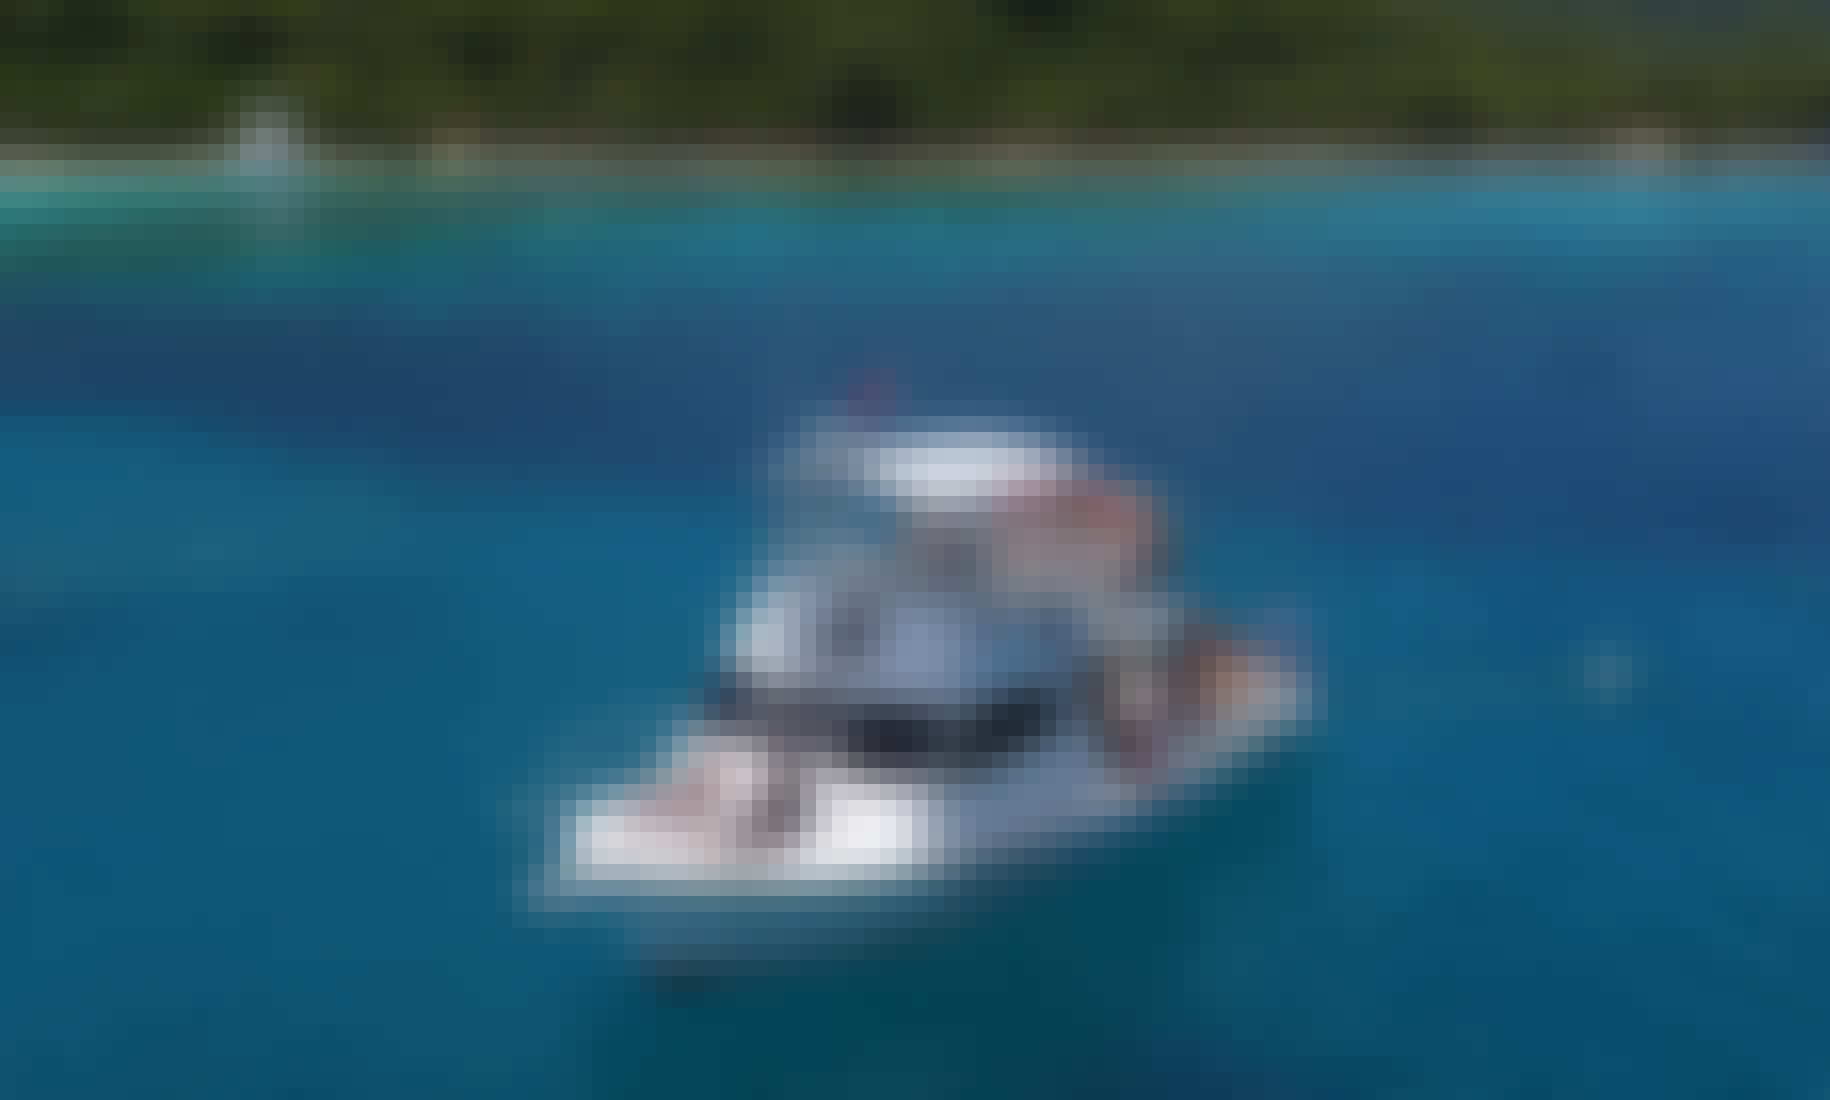 Custom Newton 36 Power Boat To Visit The Cordillera Cays (Icacos, Palominos, or Lobos)